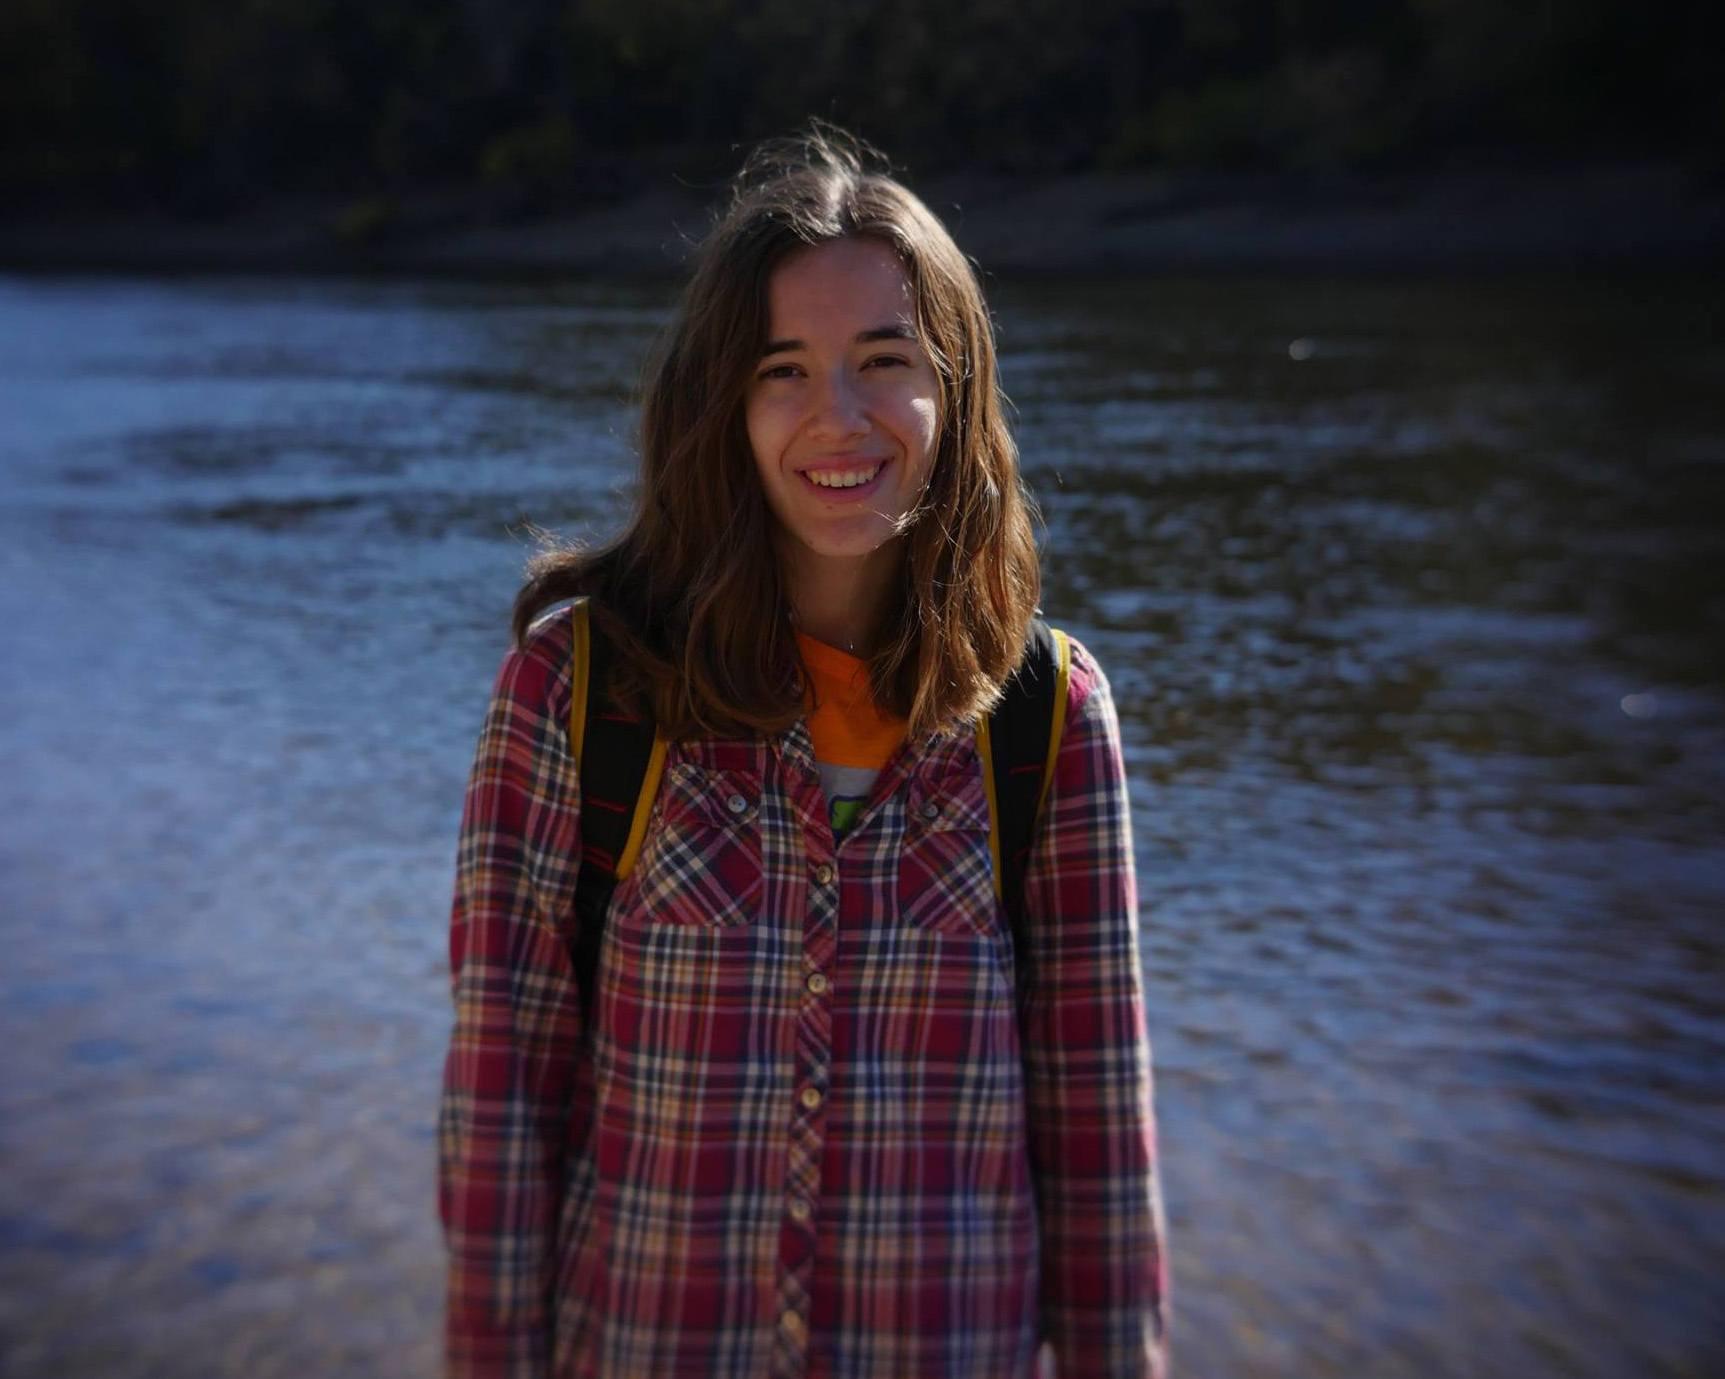 Rachel Bownik